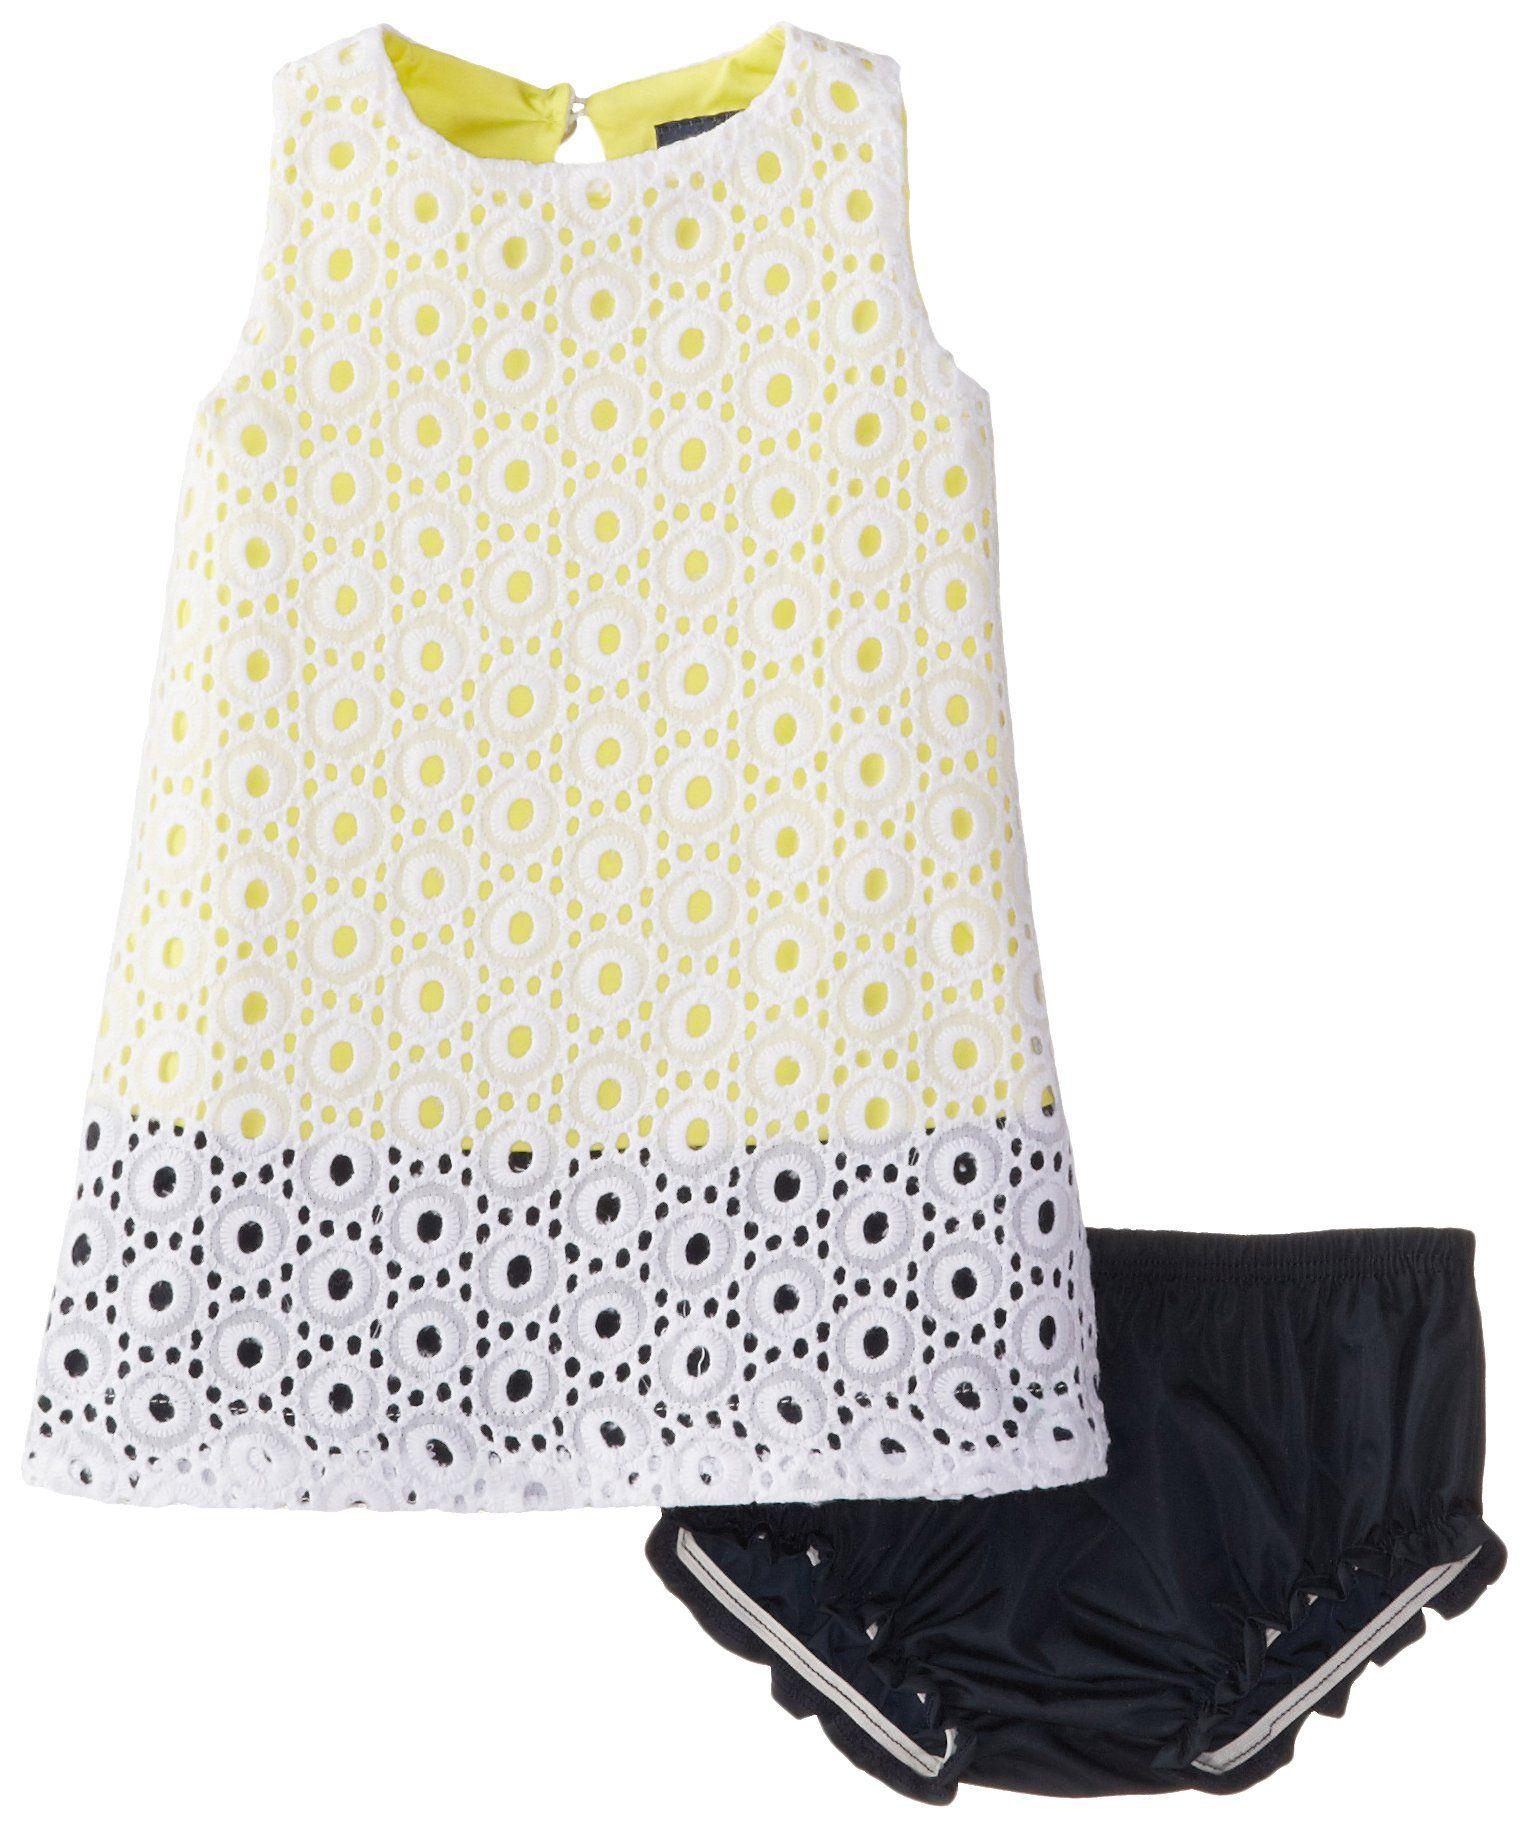 Yellow dress 3-6 months  Andy u Evan BabyGirls Newborn Eyelet Dress Yellow  Months